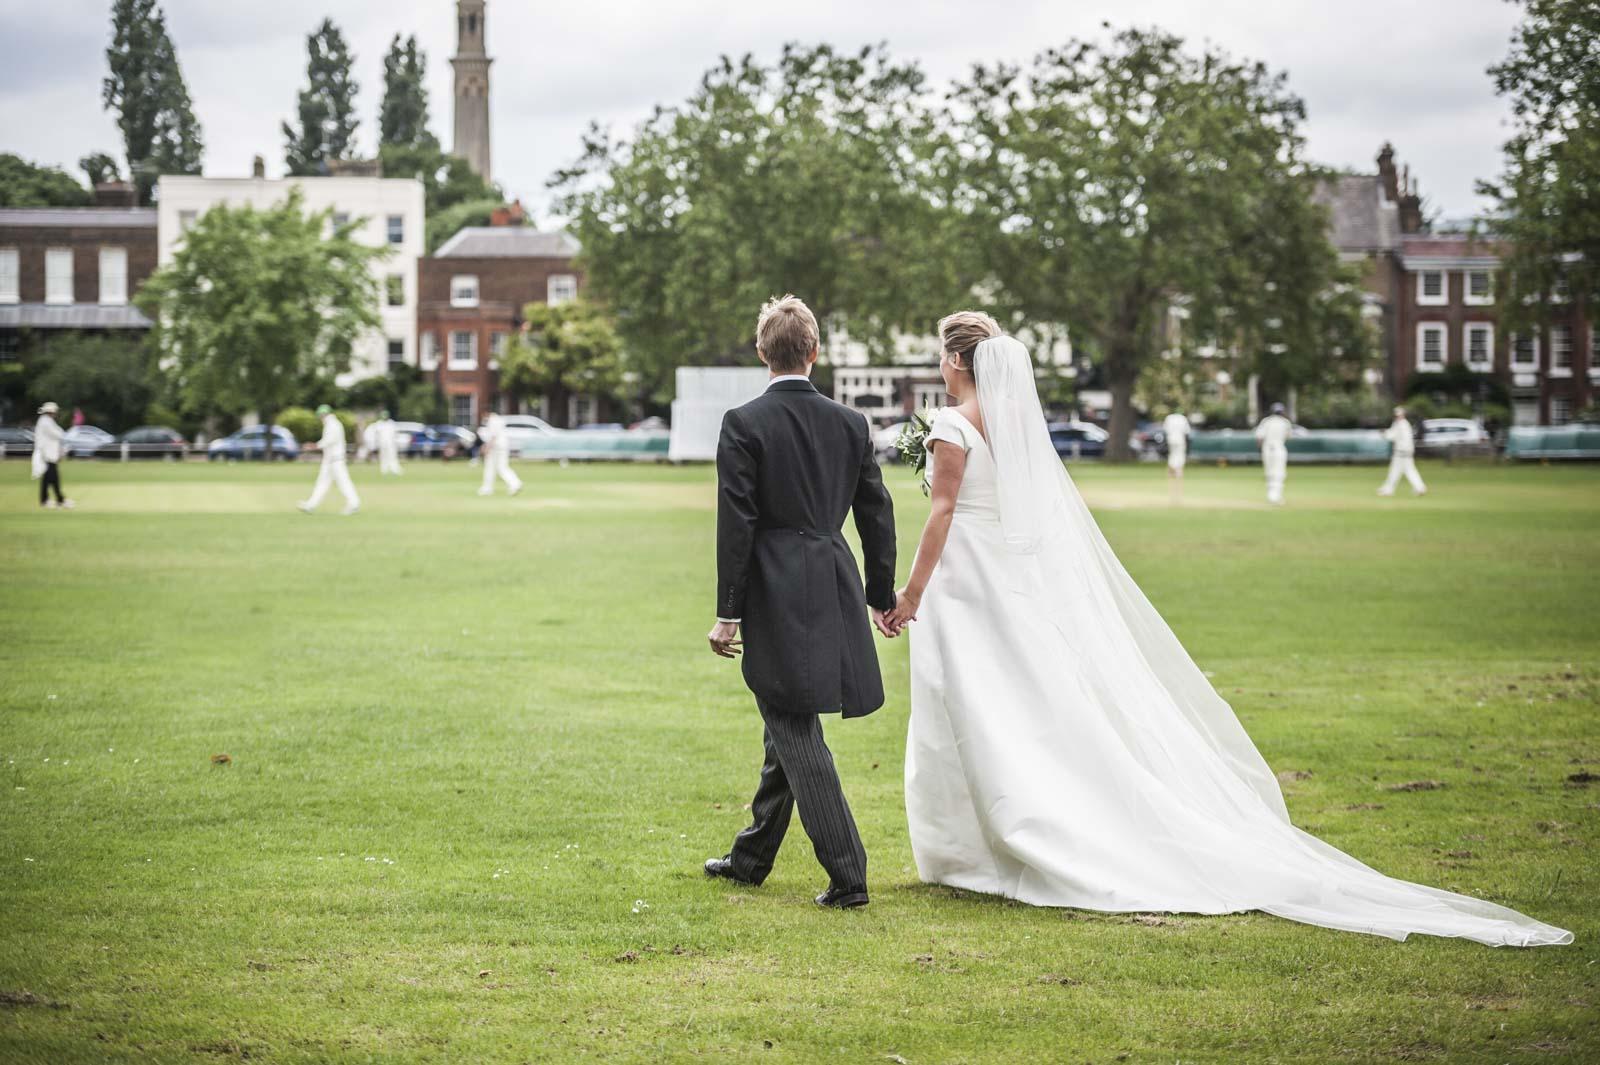 London Wedding Photographer, Sunbeam Studios, Verity and James Wedding Photography (177 of 385)